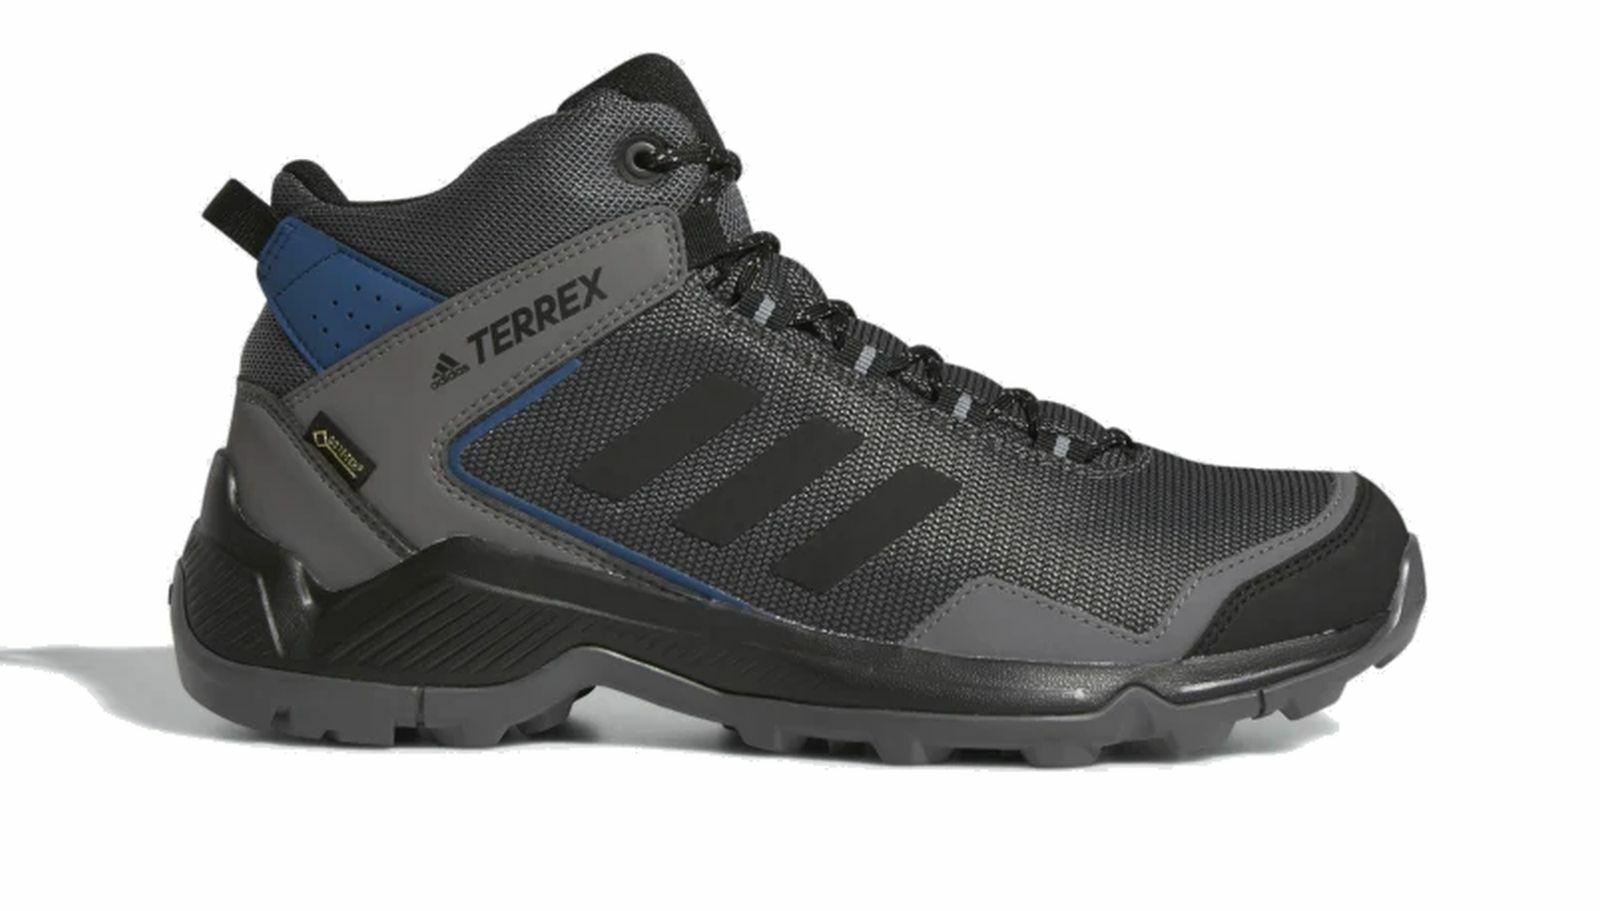 Adidas Performance Uomo Trekking All'Aperto Scarpa Terrex Eastrail Mid Mid Mid GTX Nero 13ee50